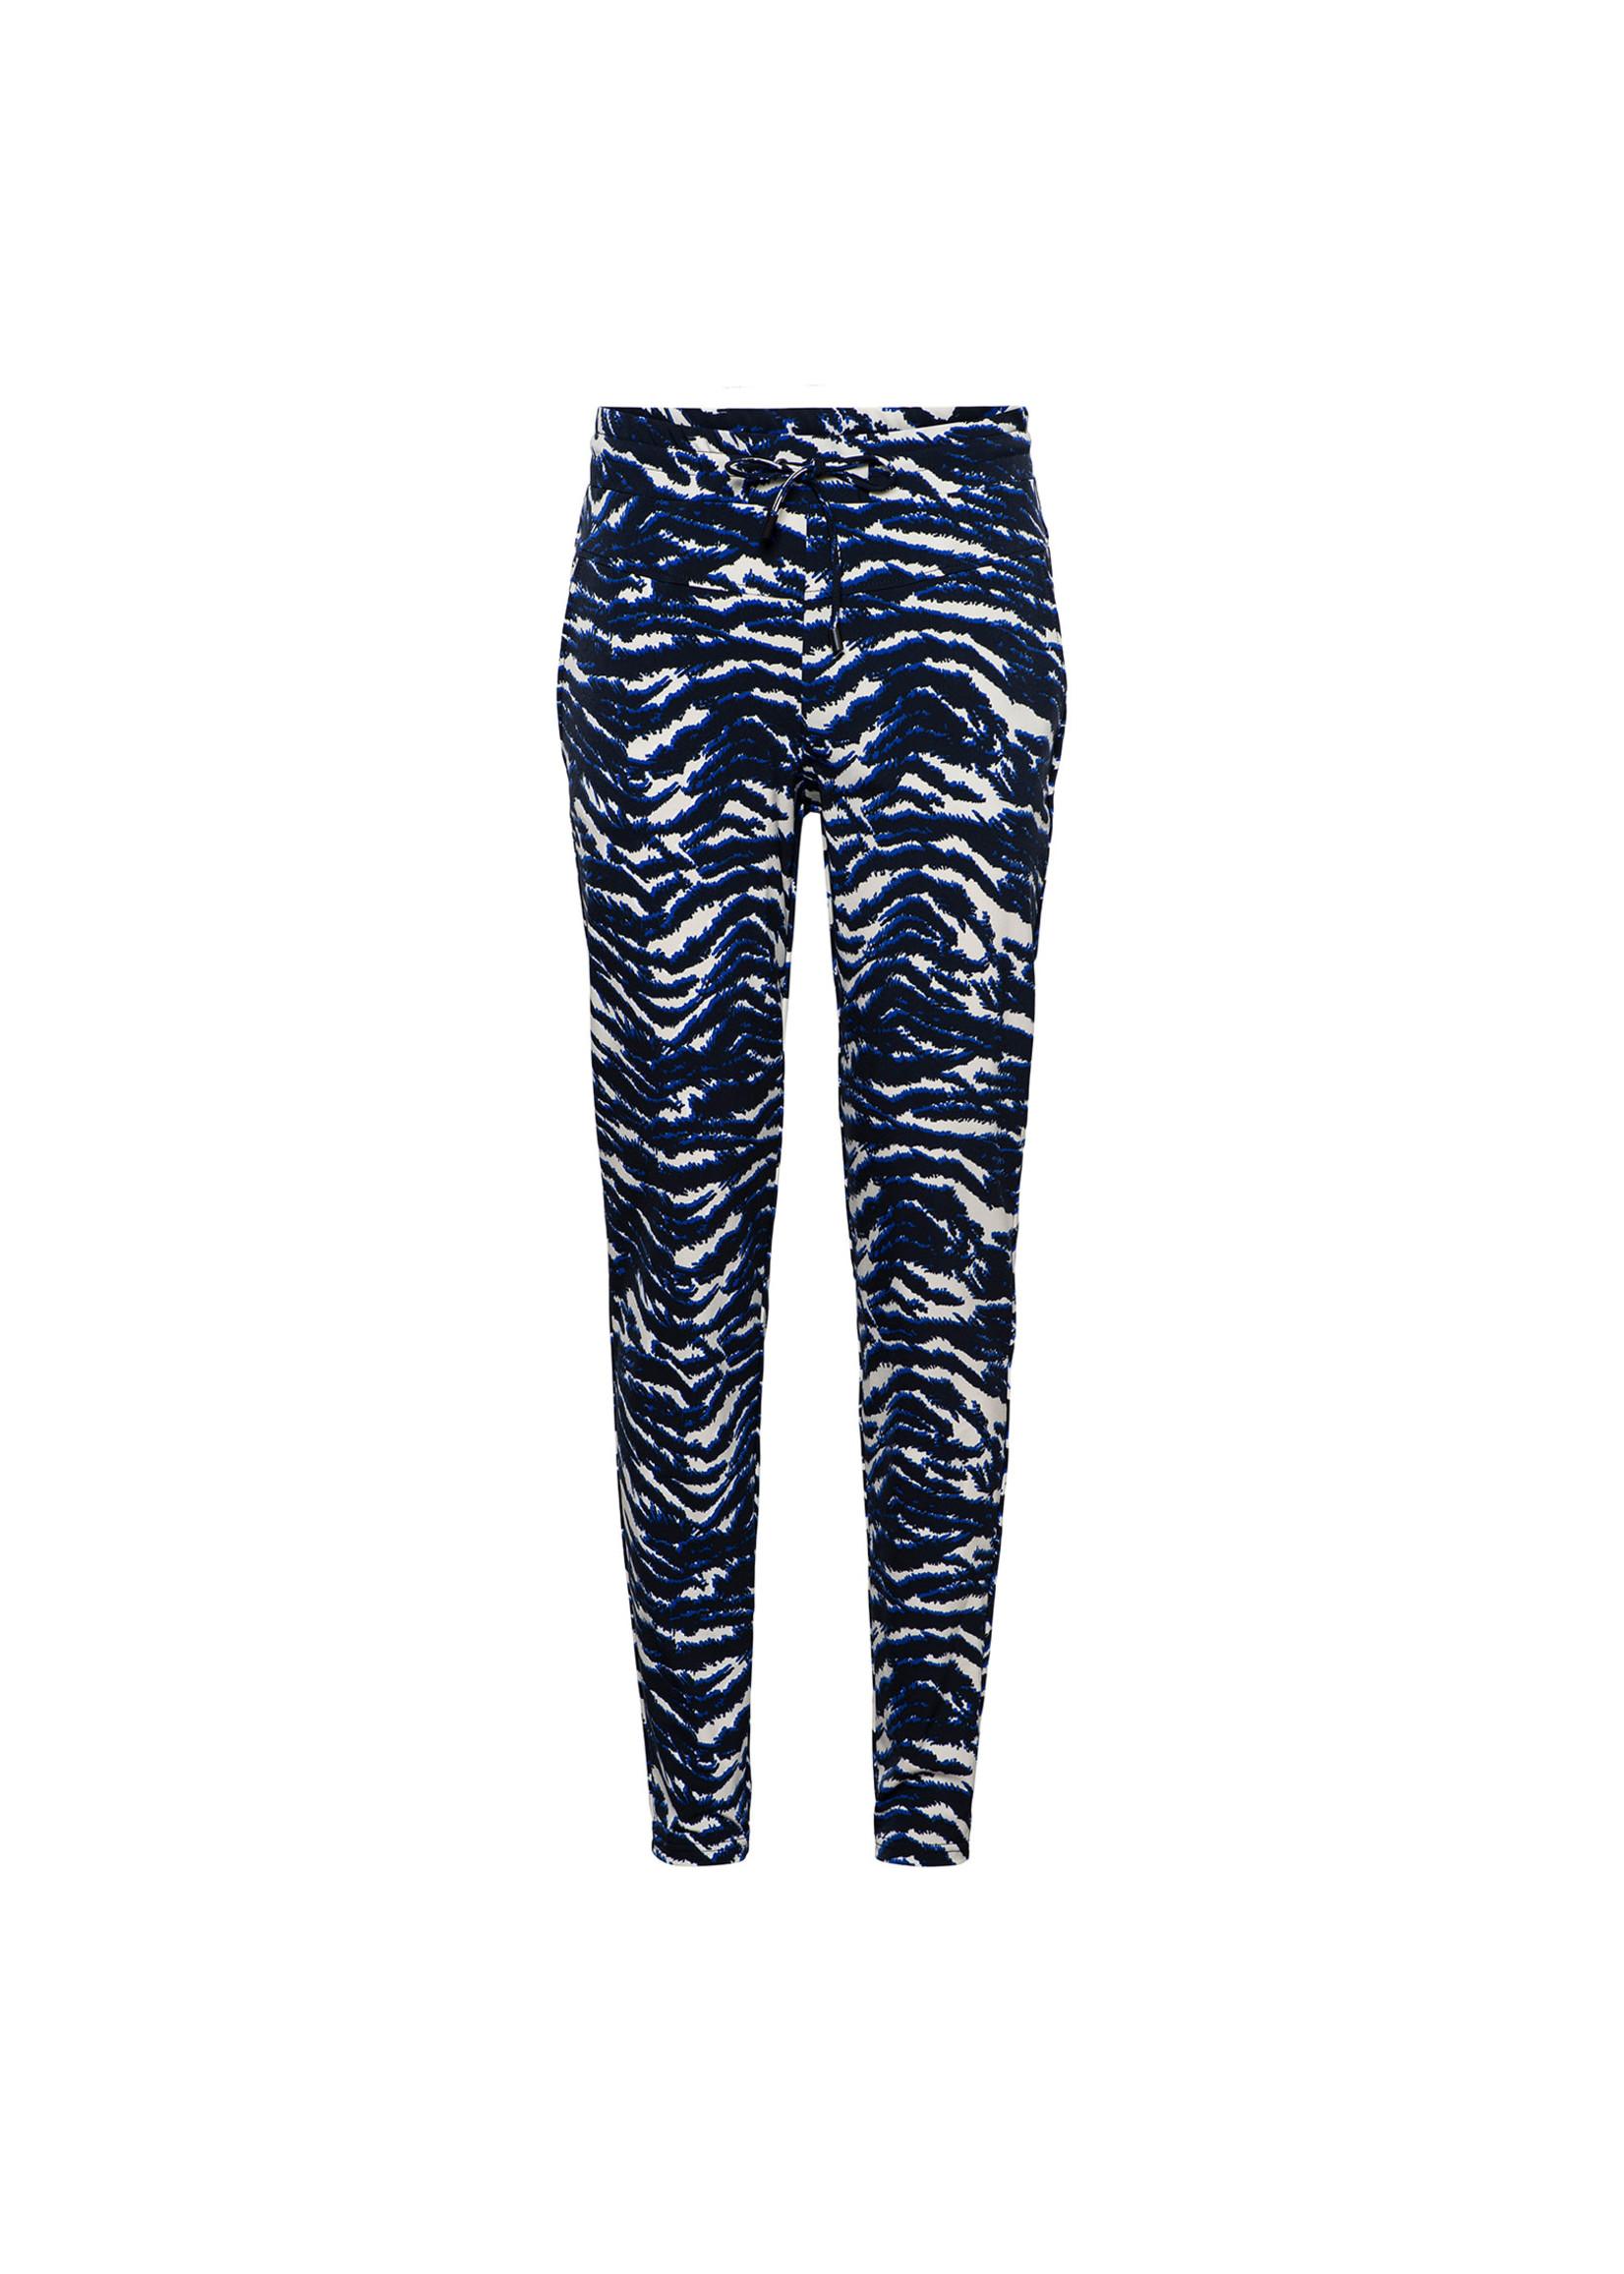 &Co Women philly pants zebra (m.navy)